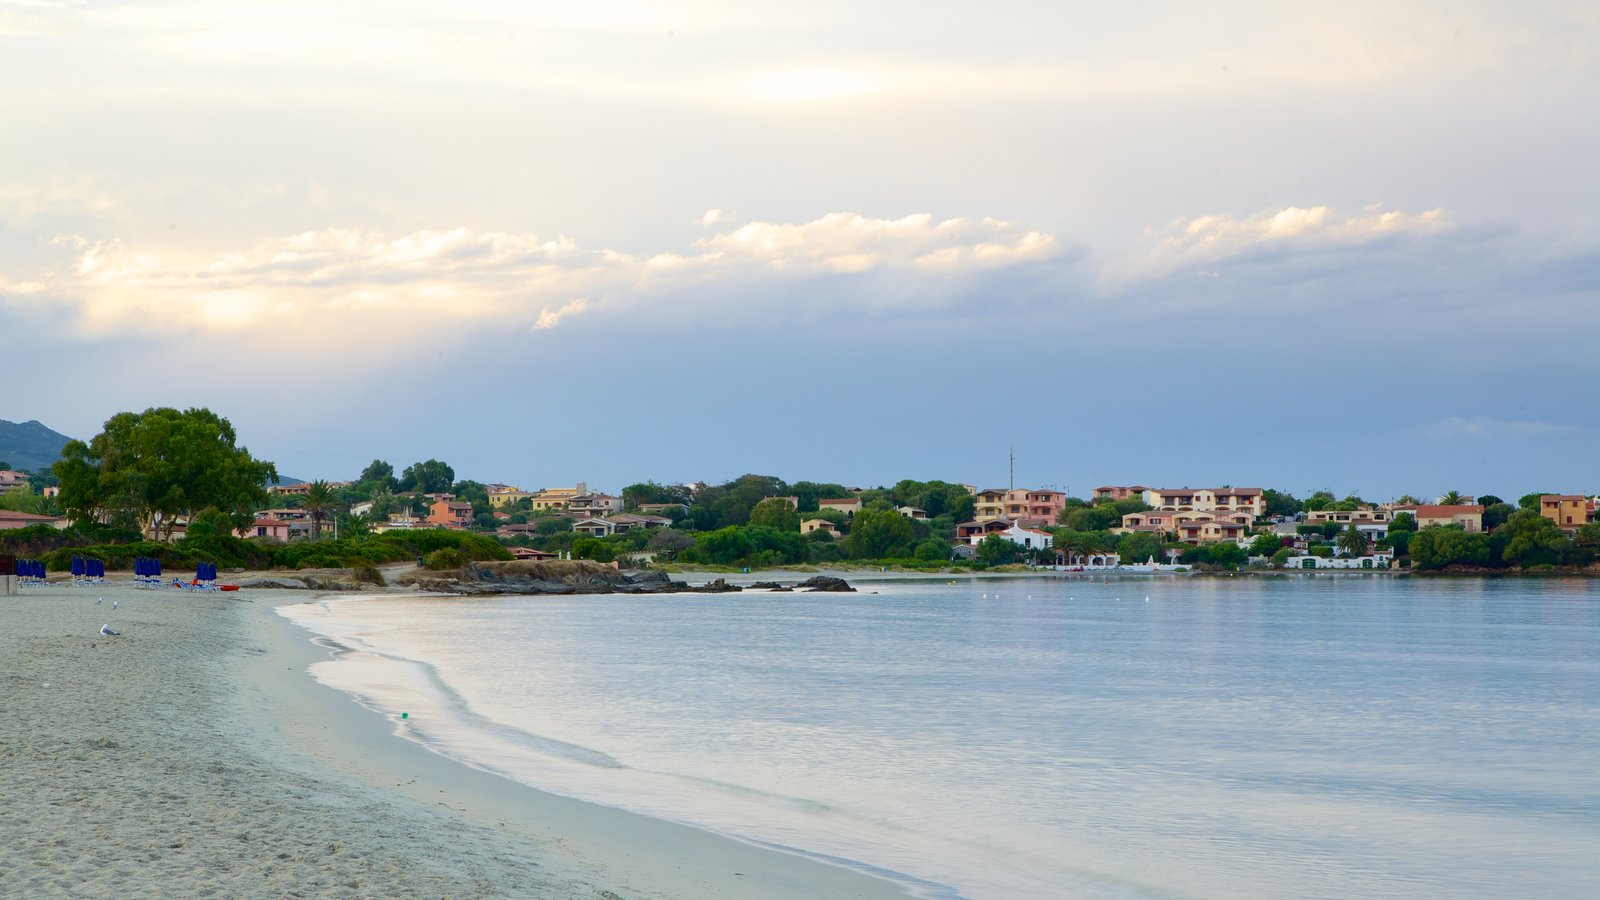 Pittulongu Beach showing a sandy beach